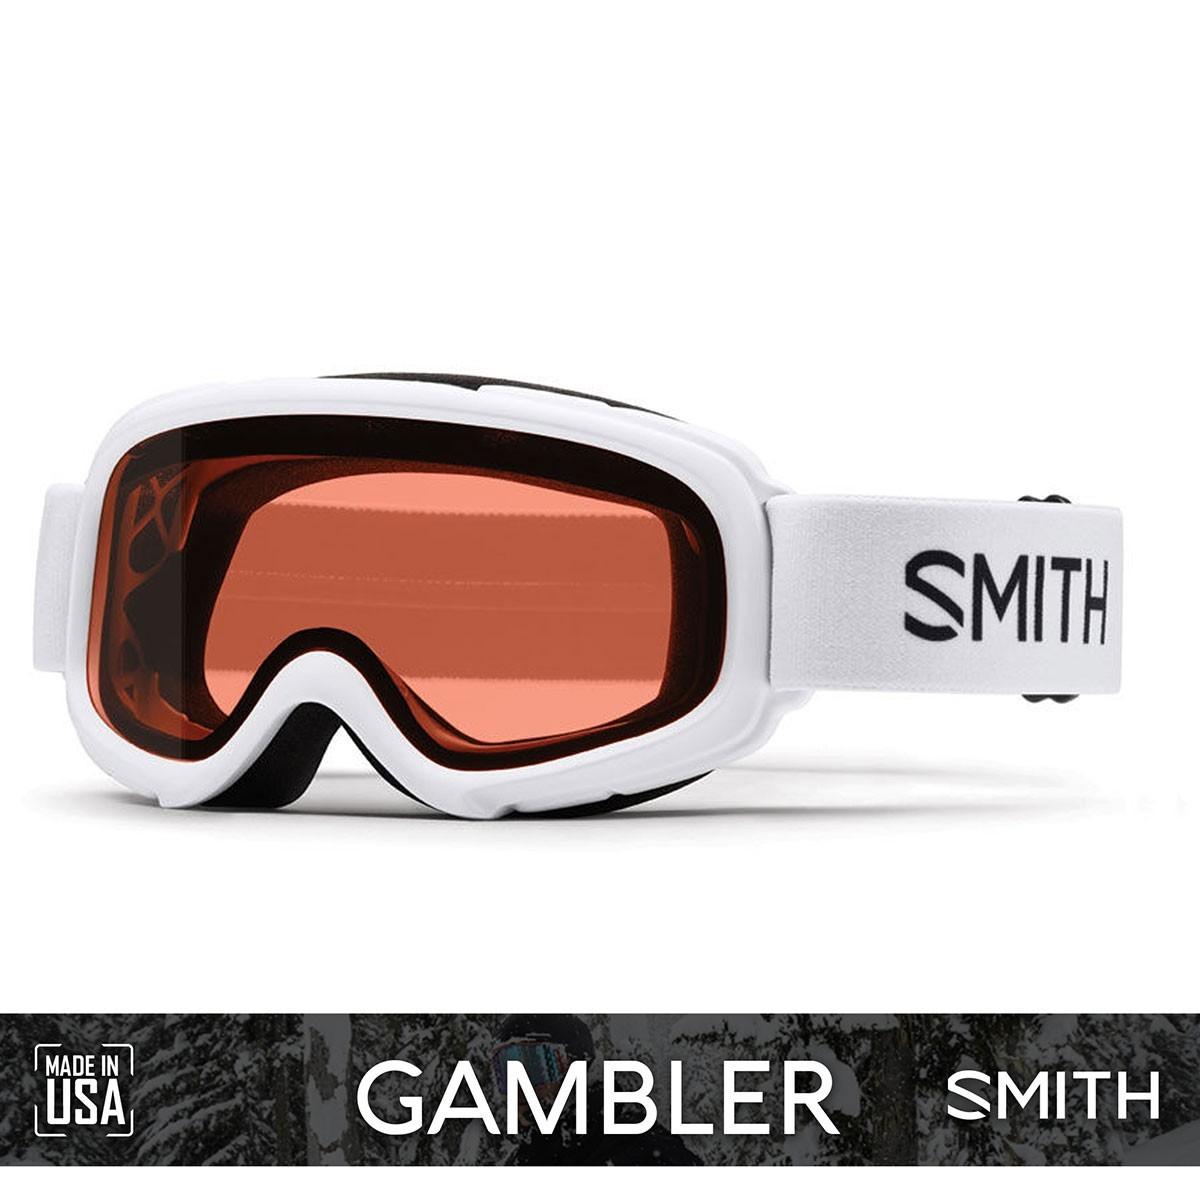 SMITH GAMBLER AIR White | S2 RC36 ROSEC - Изображение - AQUAMATRIX